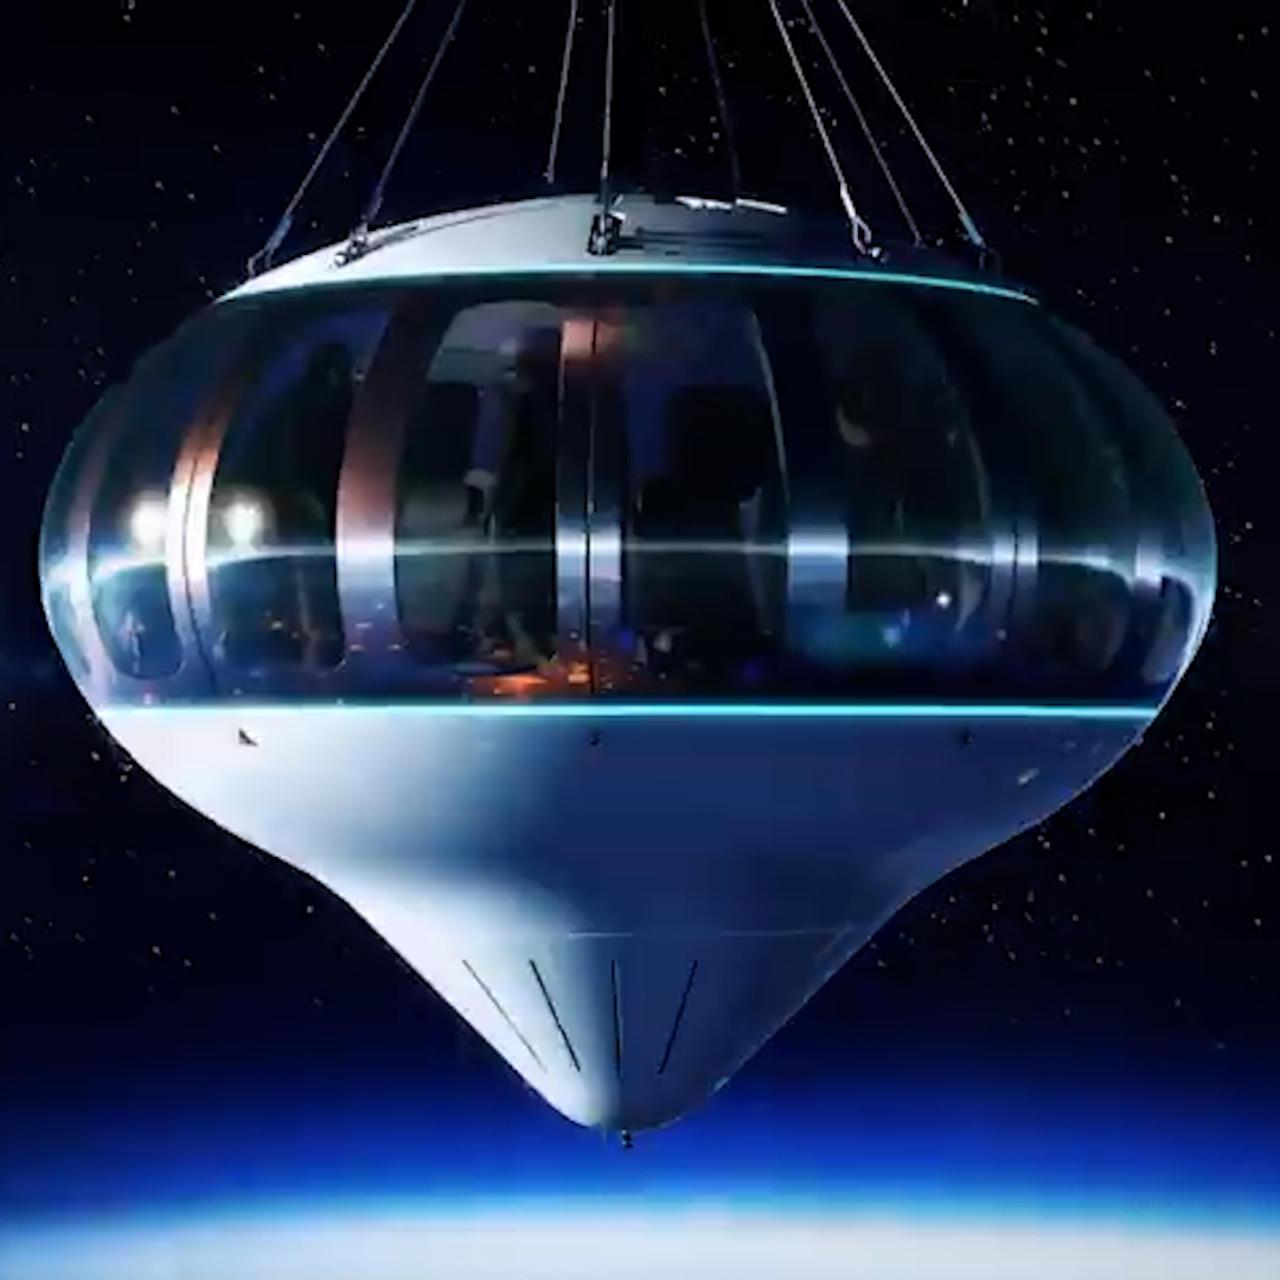 See the world at 100,000 feet